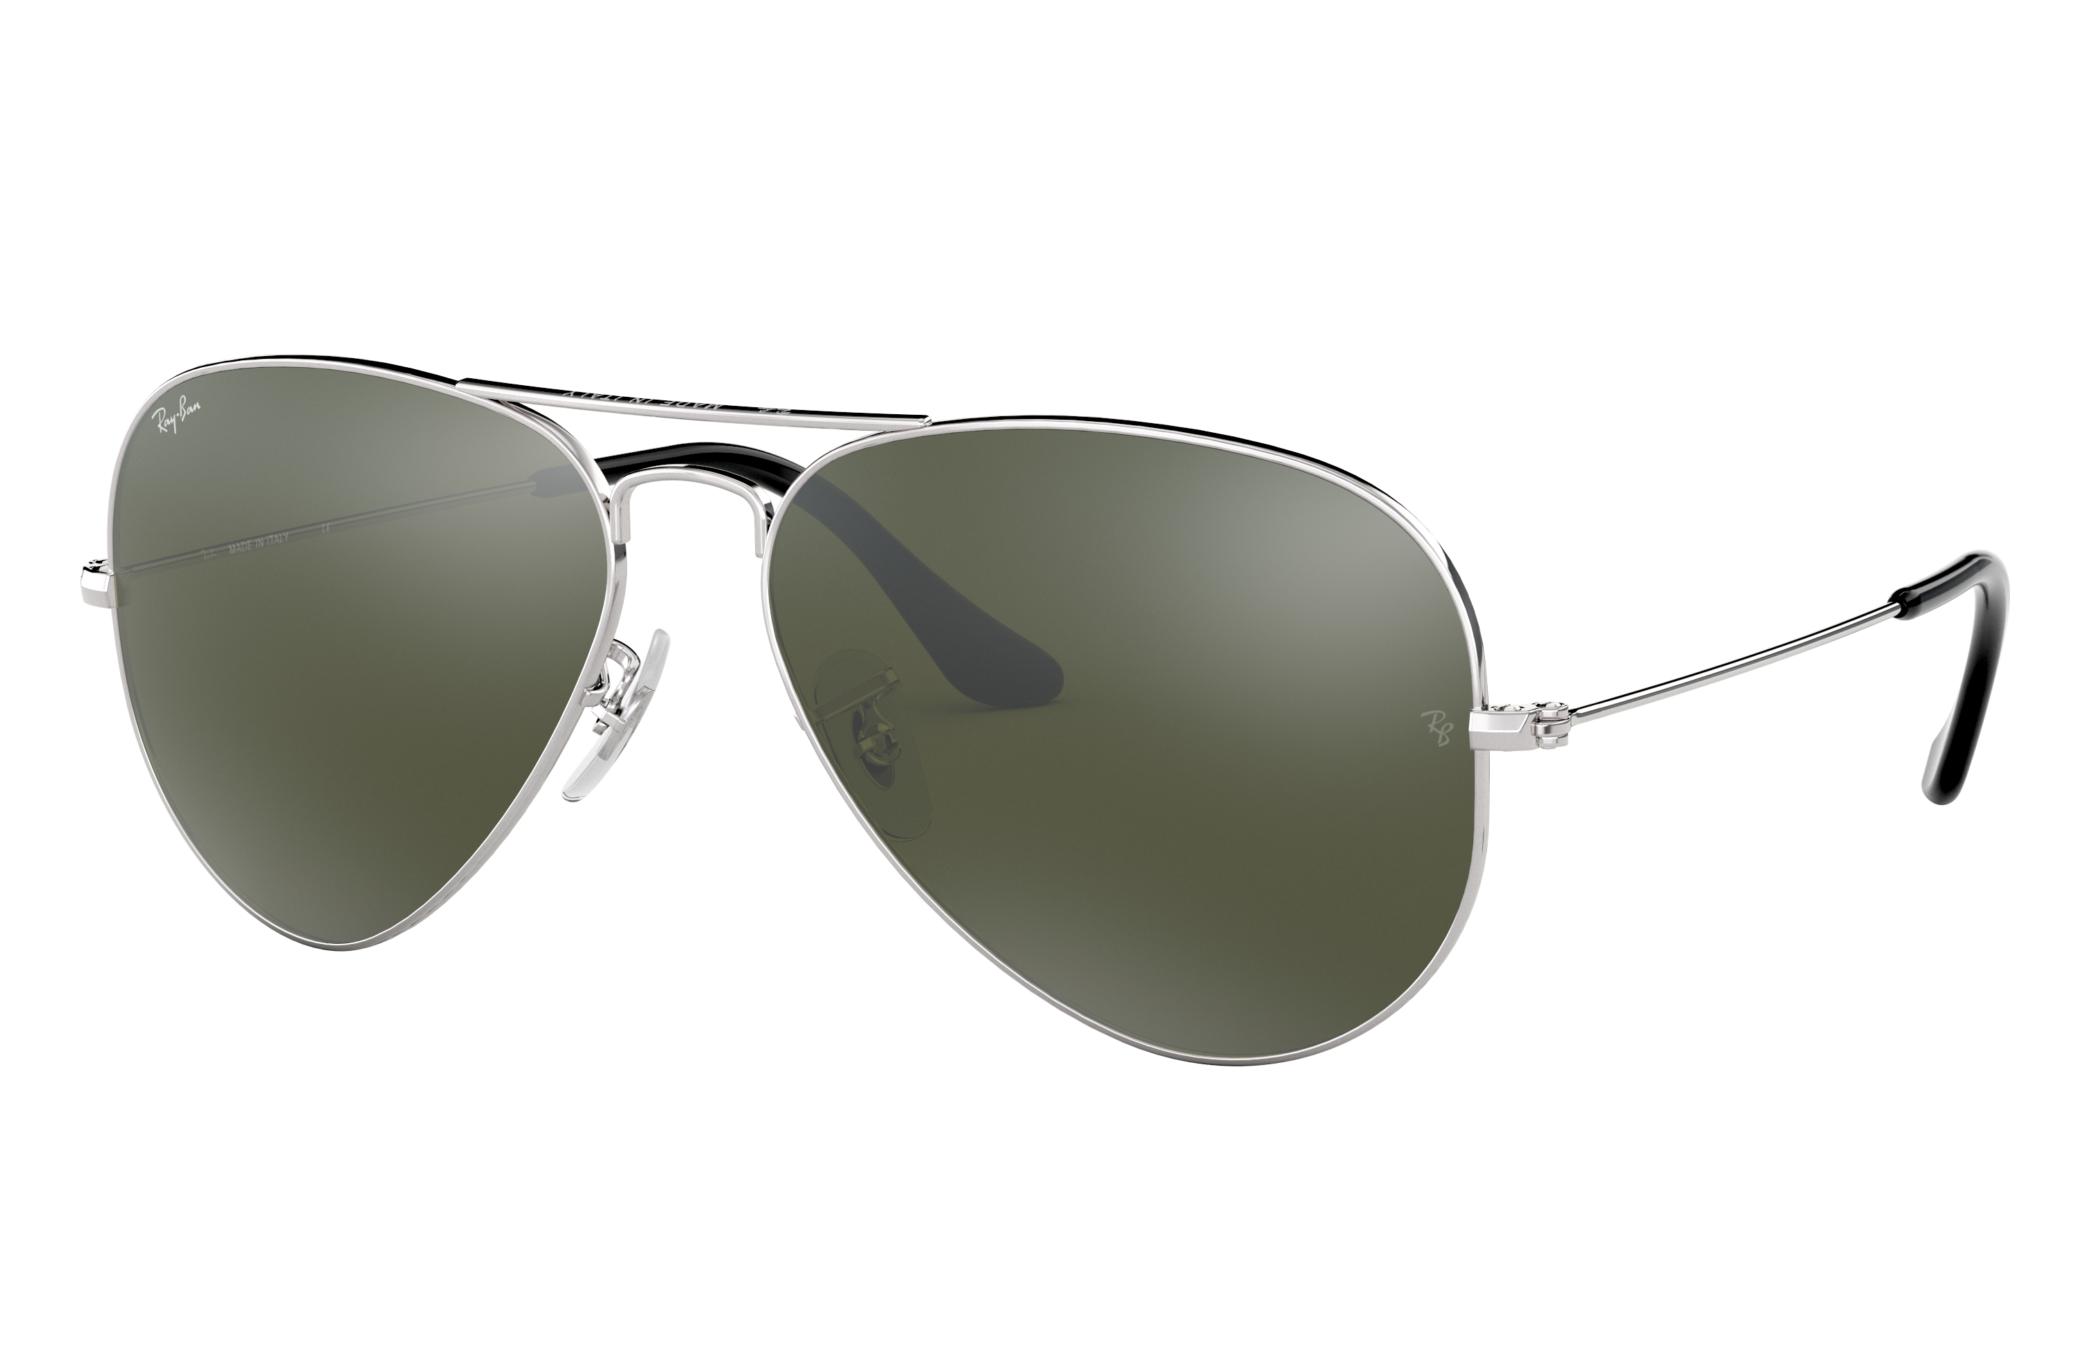 Ray-Ban Aviator Mirror Silver, Grey Lenses - RB3025